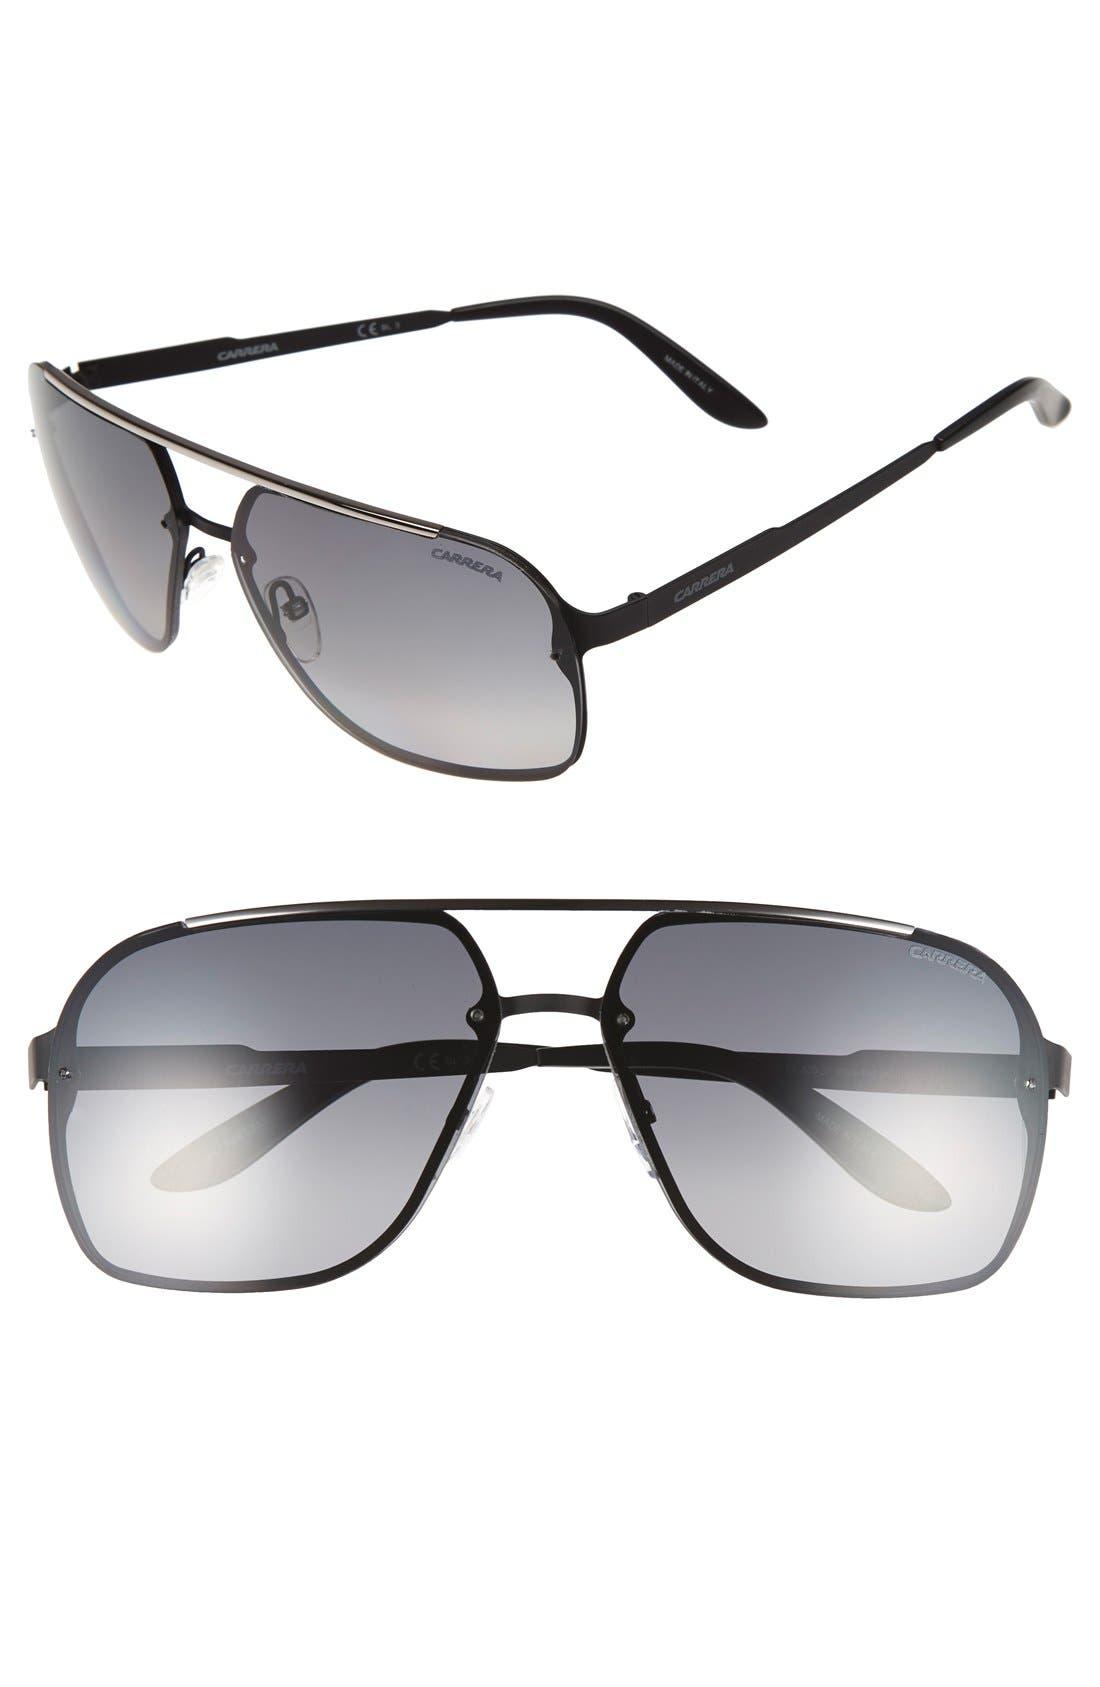 '91/S' 64mm Polarized Sunglasses,                         Main,                         color, Black Matte/ Grey